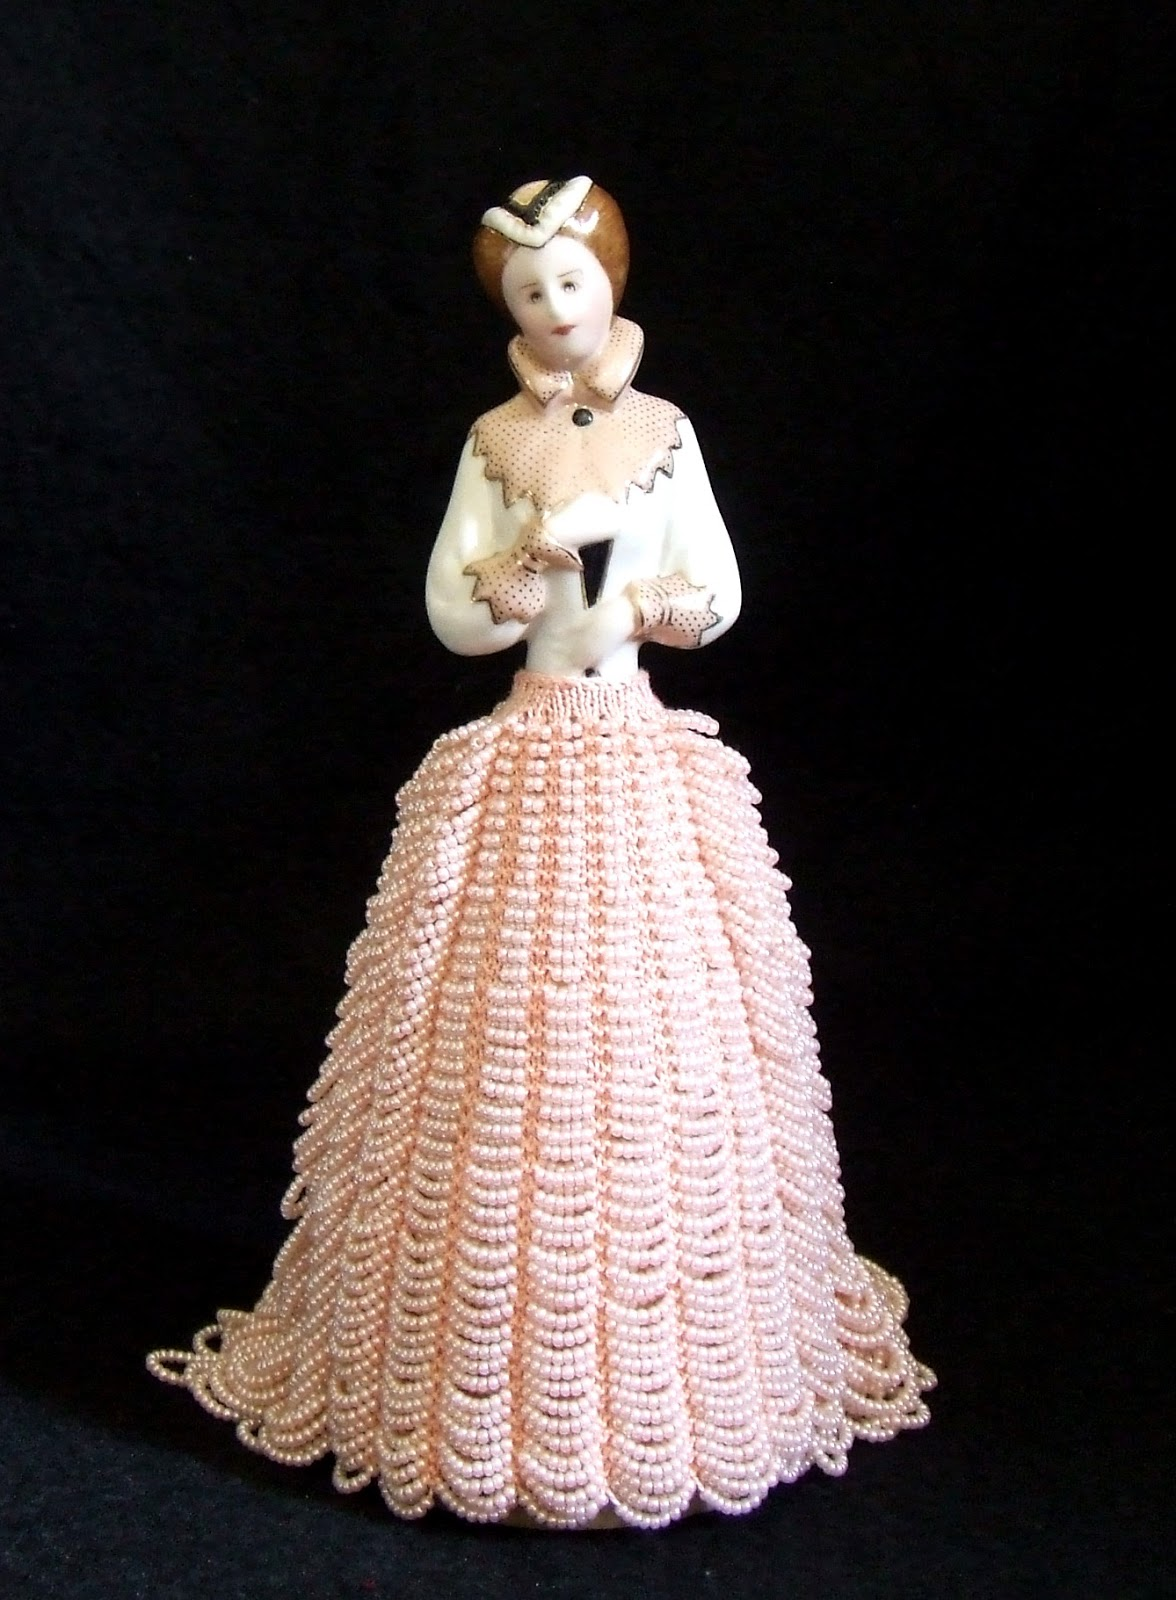 Beaded Knitting Patterns Half Dolls : Beading Belles: Half Doll Queen Ann